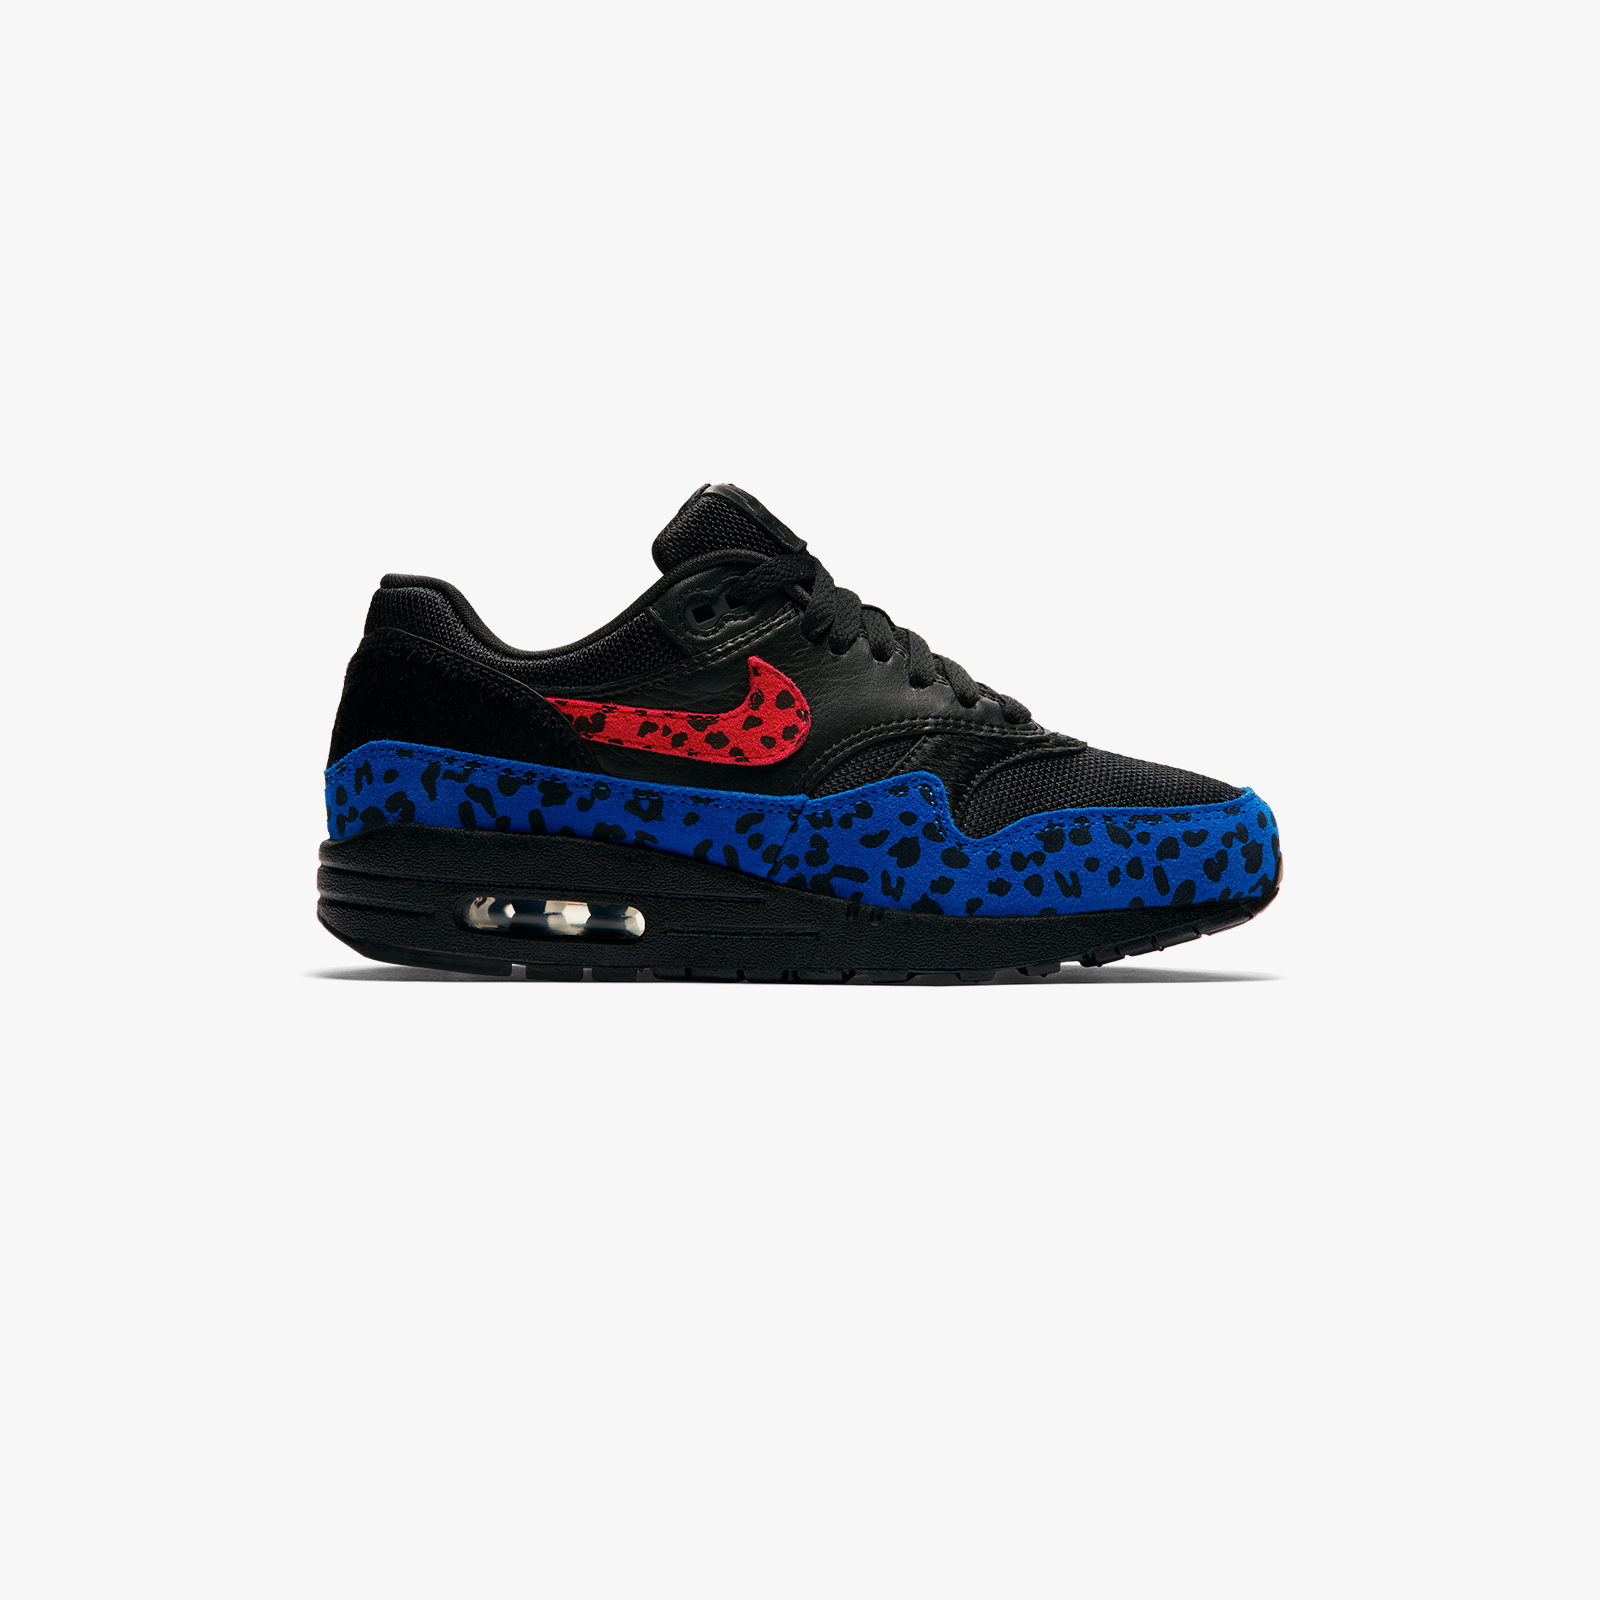 Nike Wmns Air Max 1 Premium - Bv1977-001 - Sneakersnstuff  68921dd91